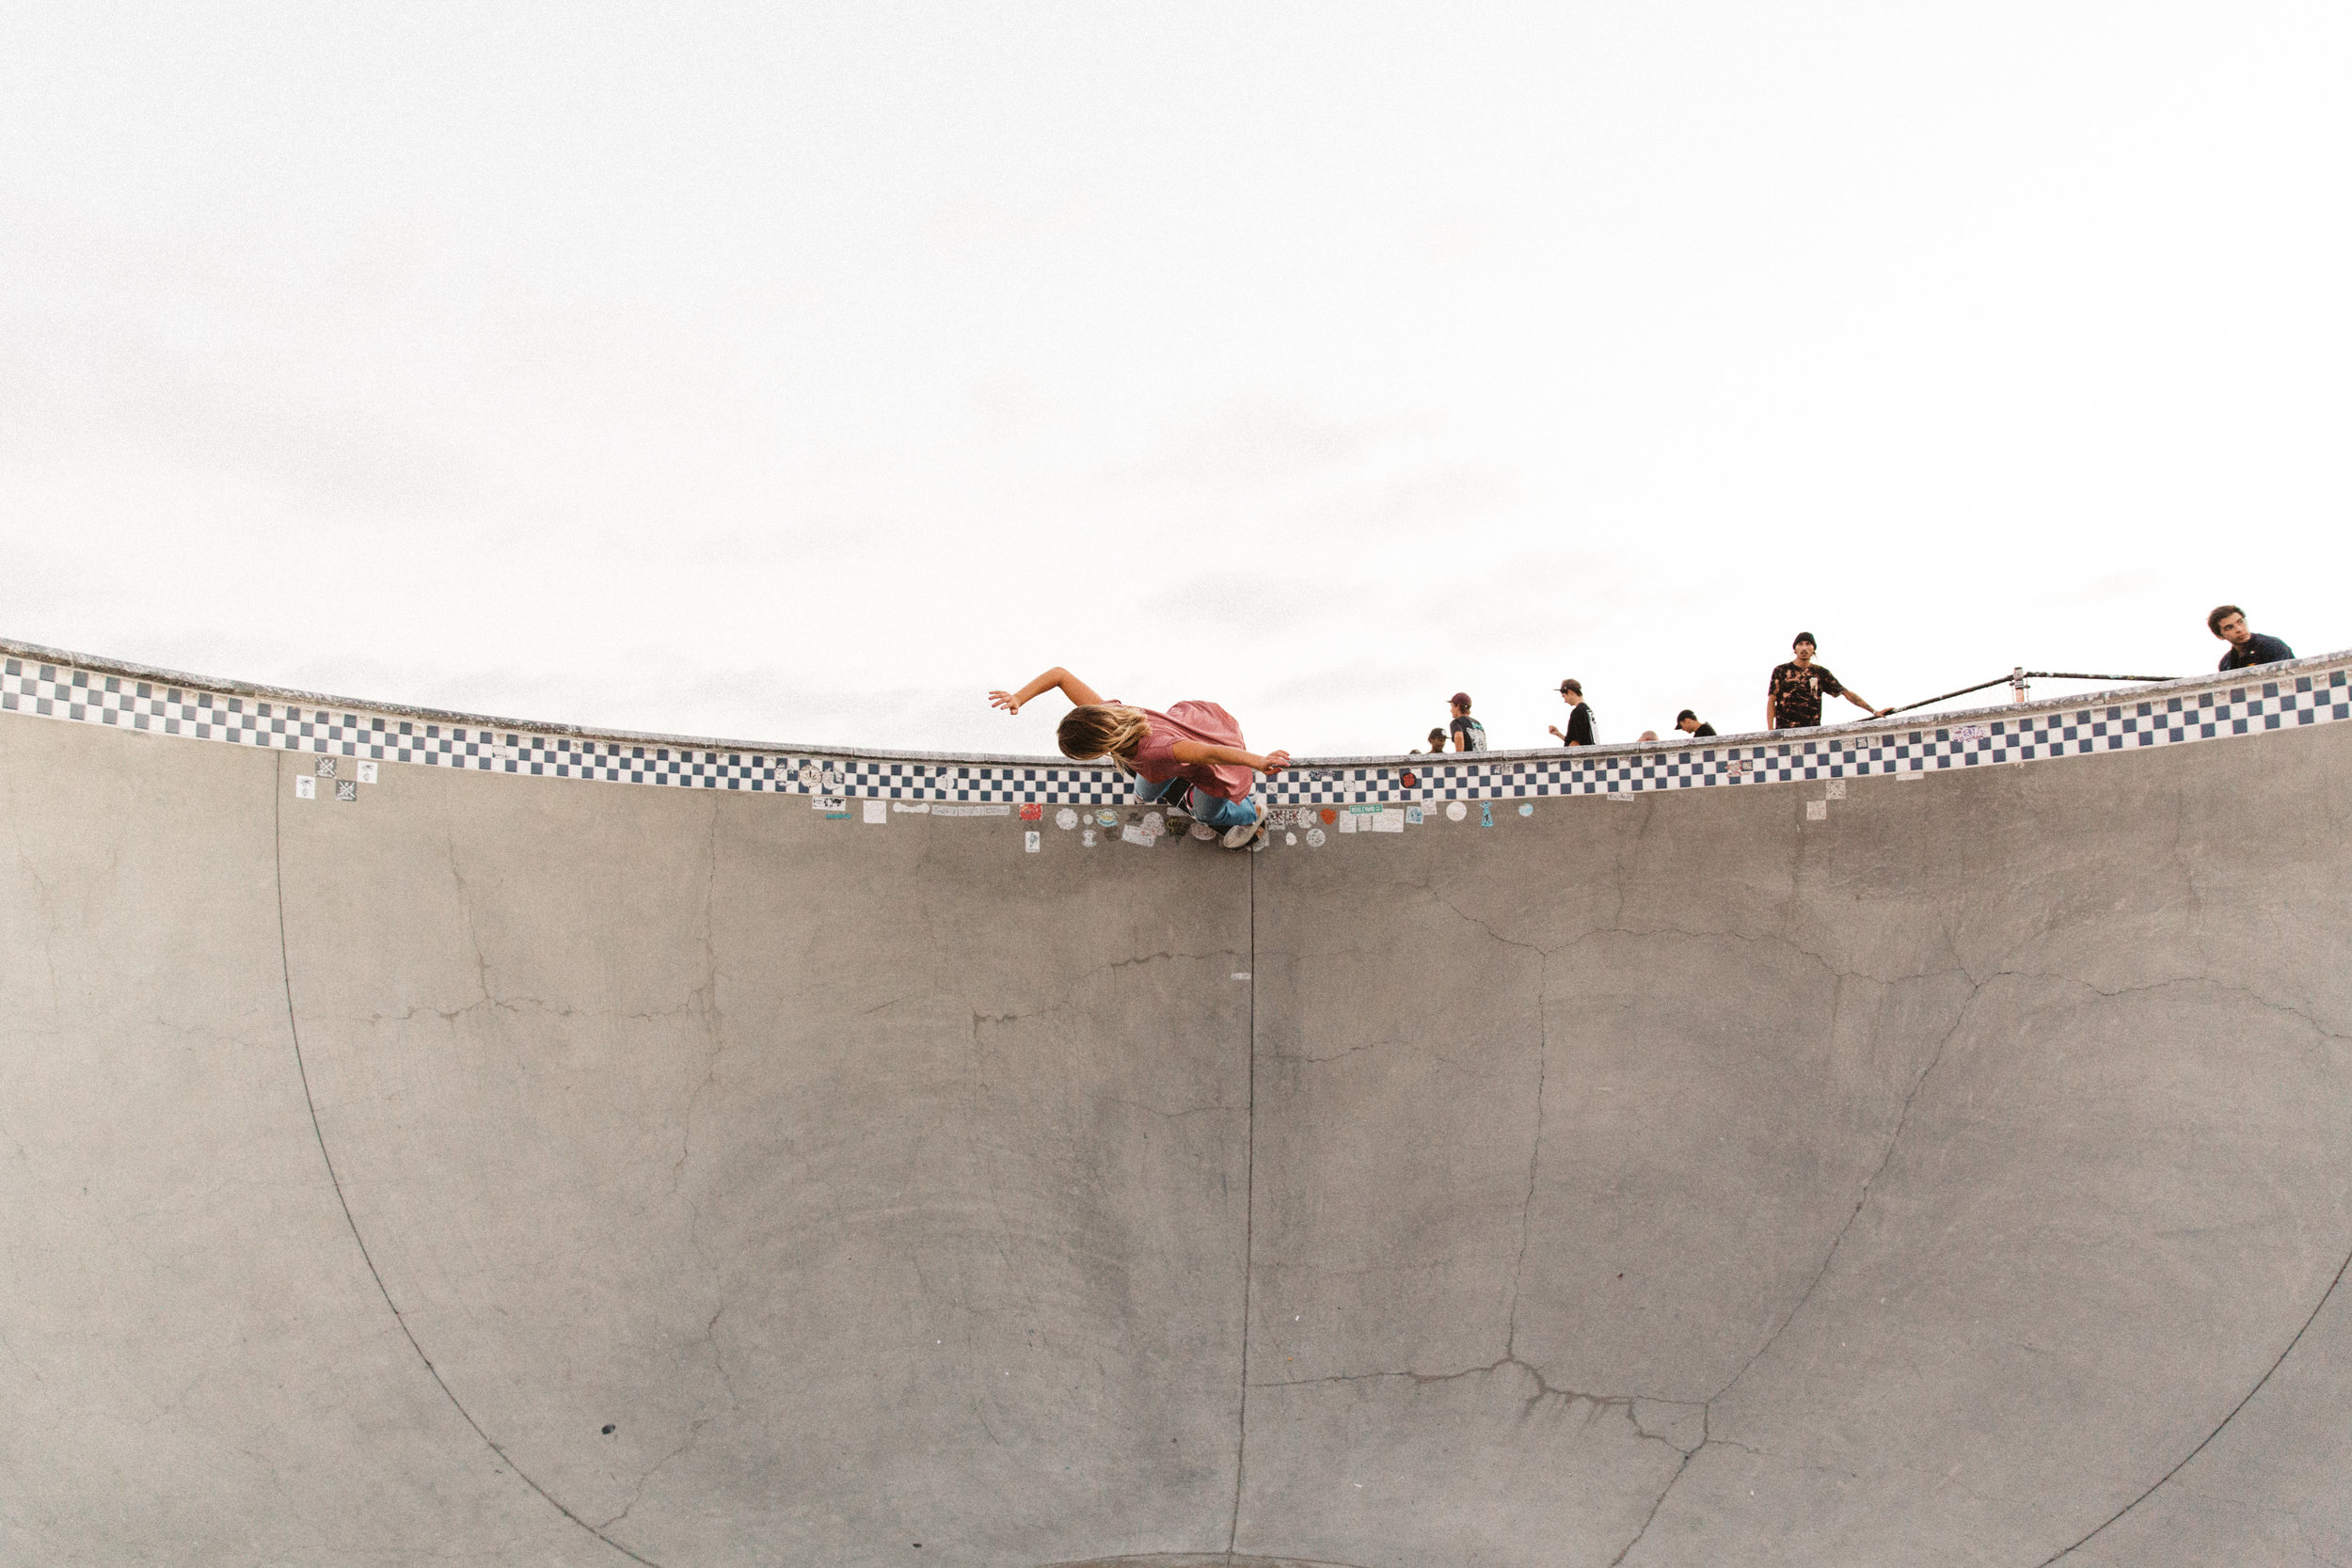 SkaterBabes-2089.jpg